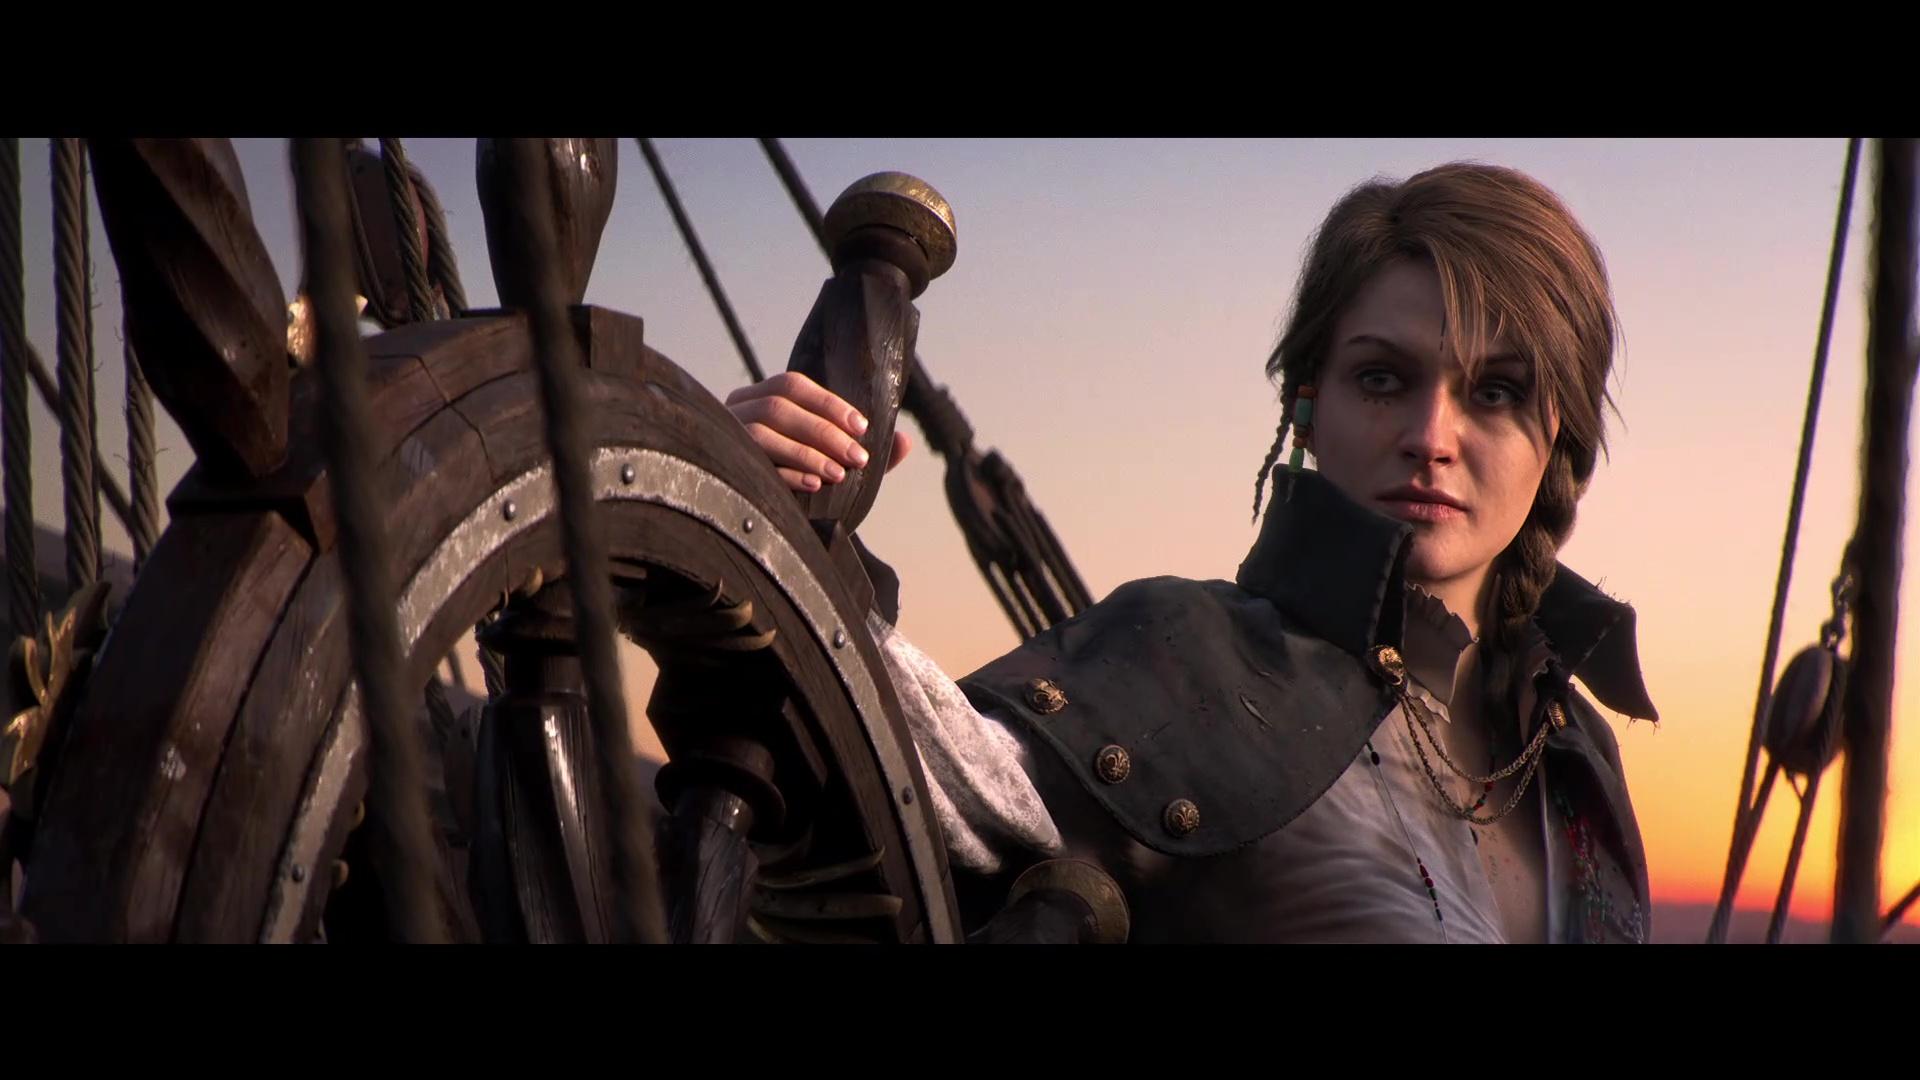 Ubisoft highlights Skull & Bones naval combat in the latest E3